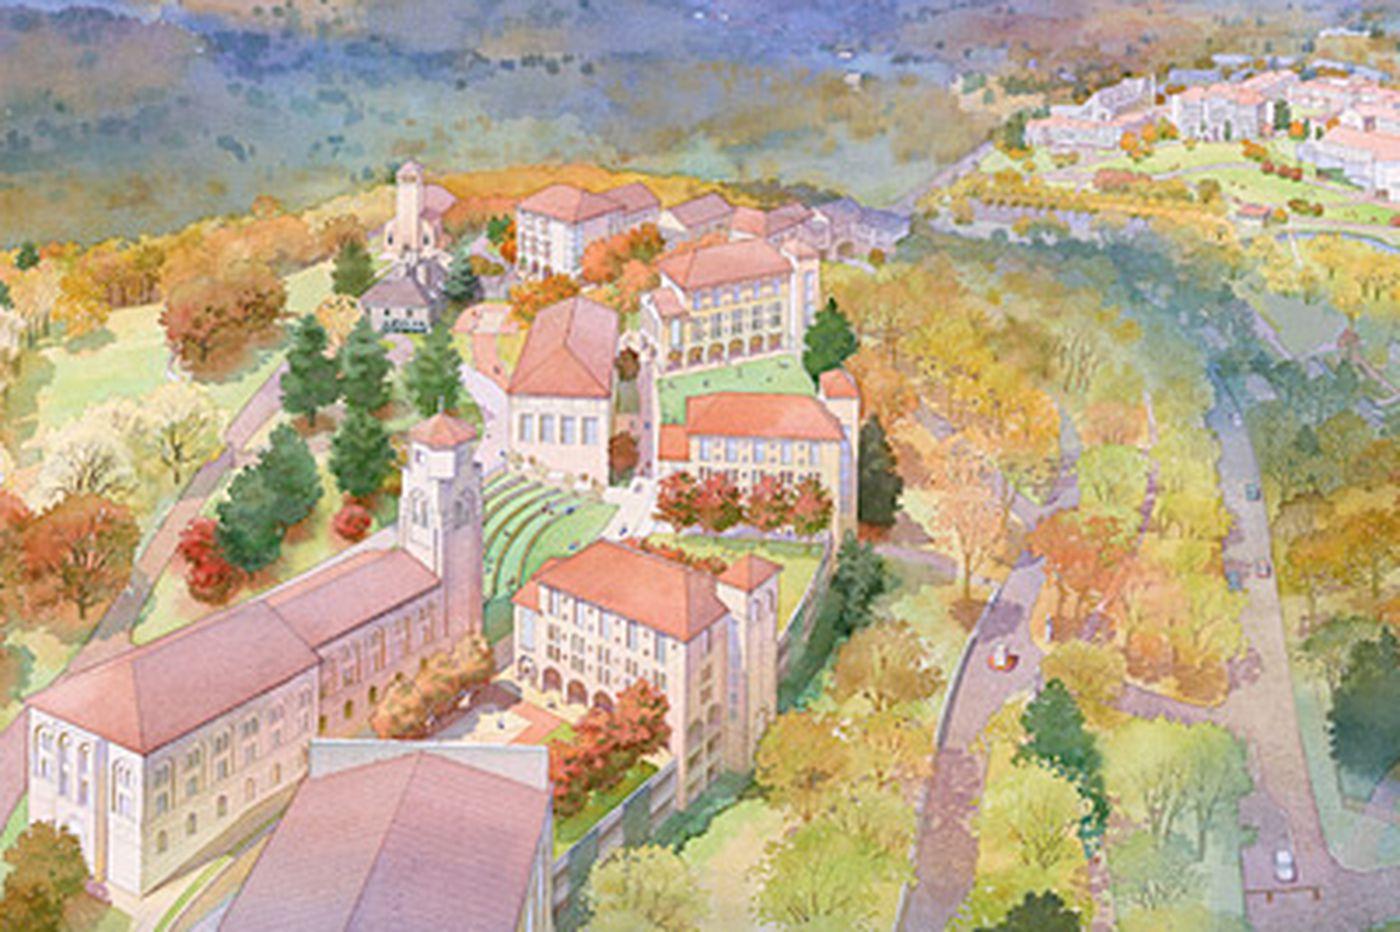 Chestnut Hill College plans major expansion